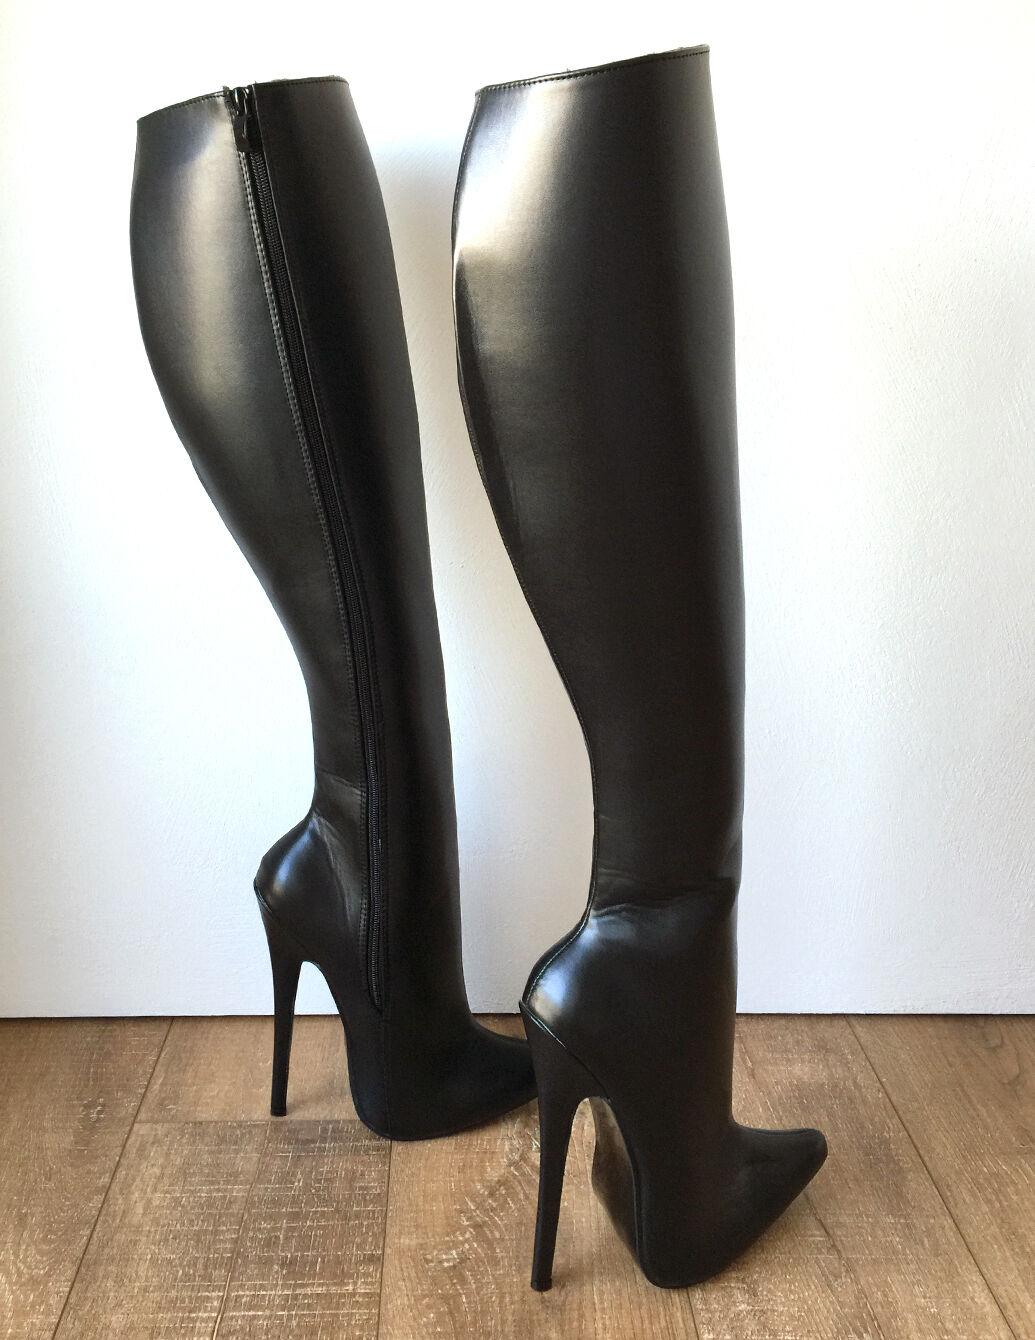 RTBU TALMA 18cm Stiletto Hard Shaft Knee Hi Vegan Boots Personalized Shaft